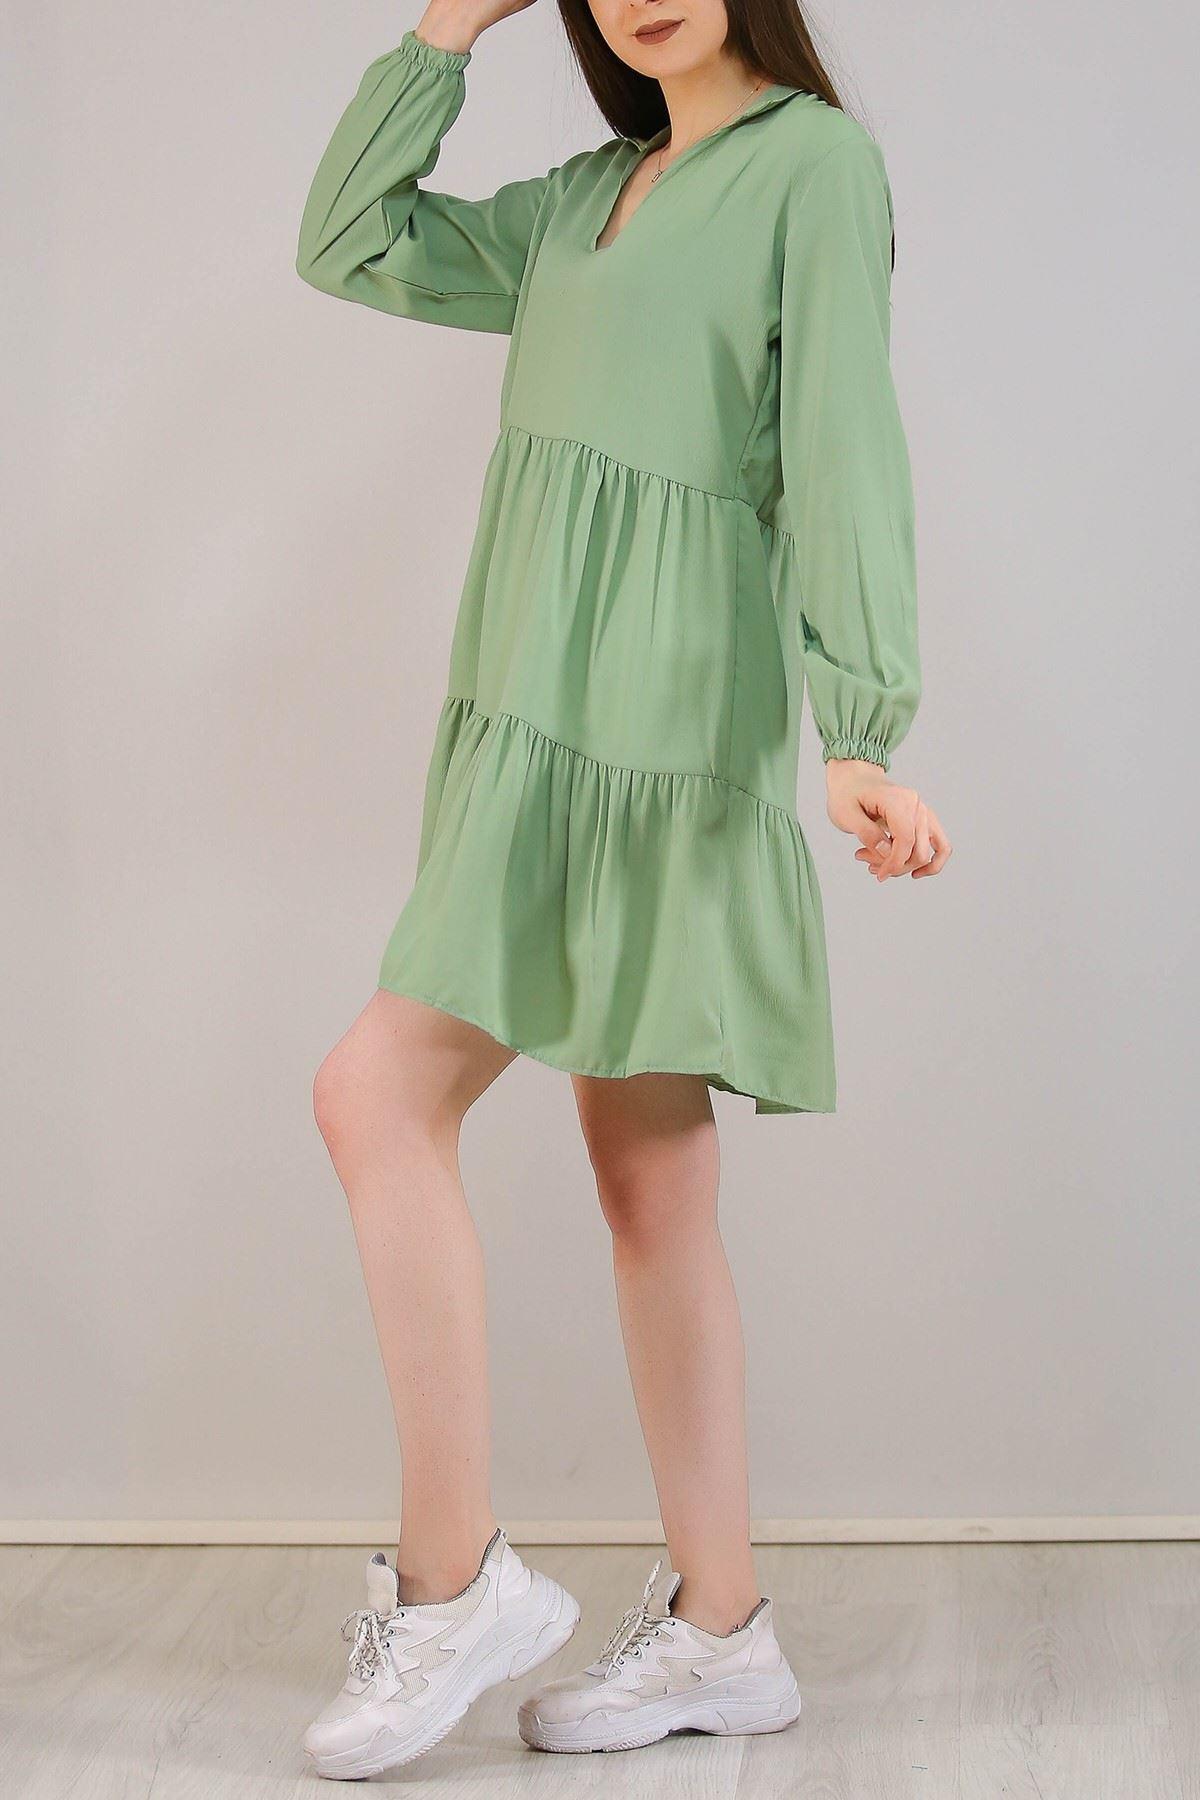 Kısa Krep Elbise Mint - 5273.701.